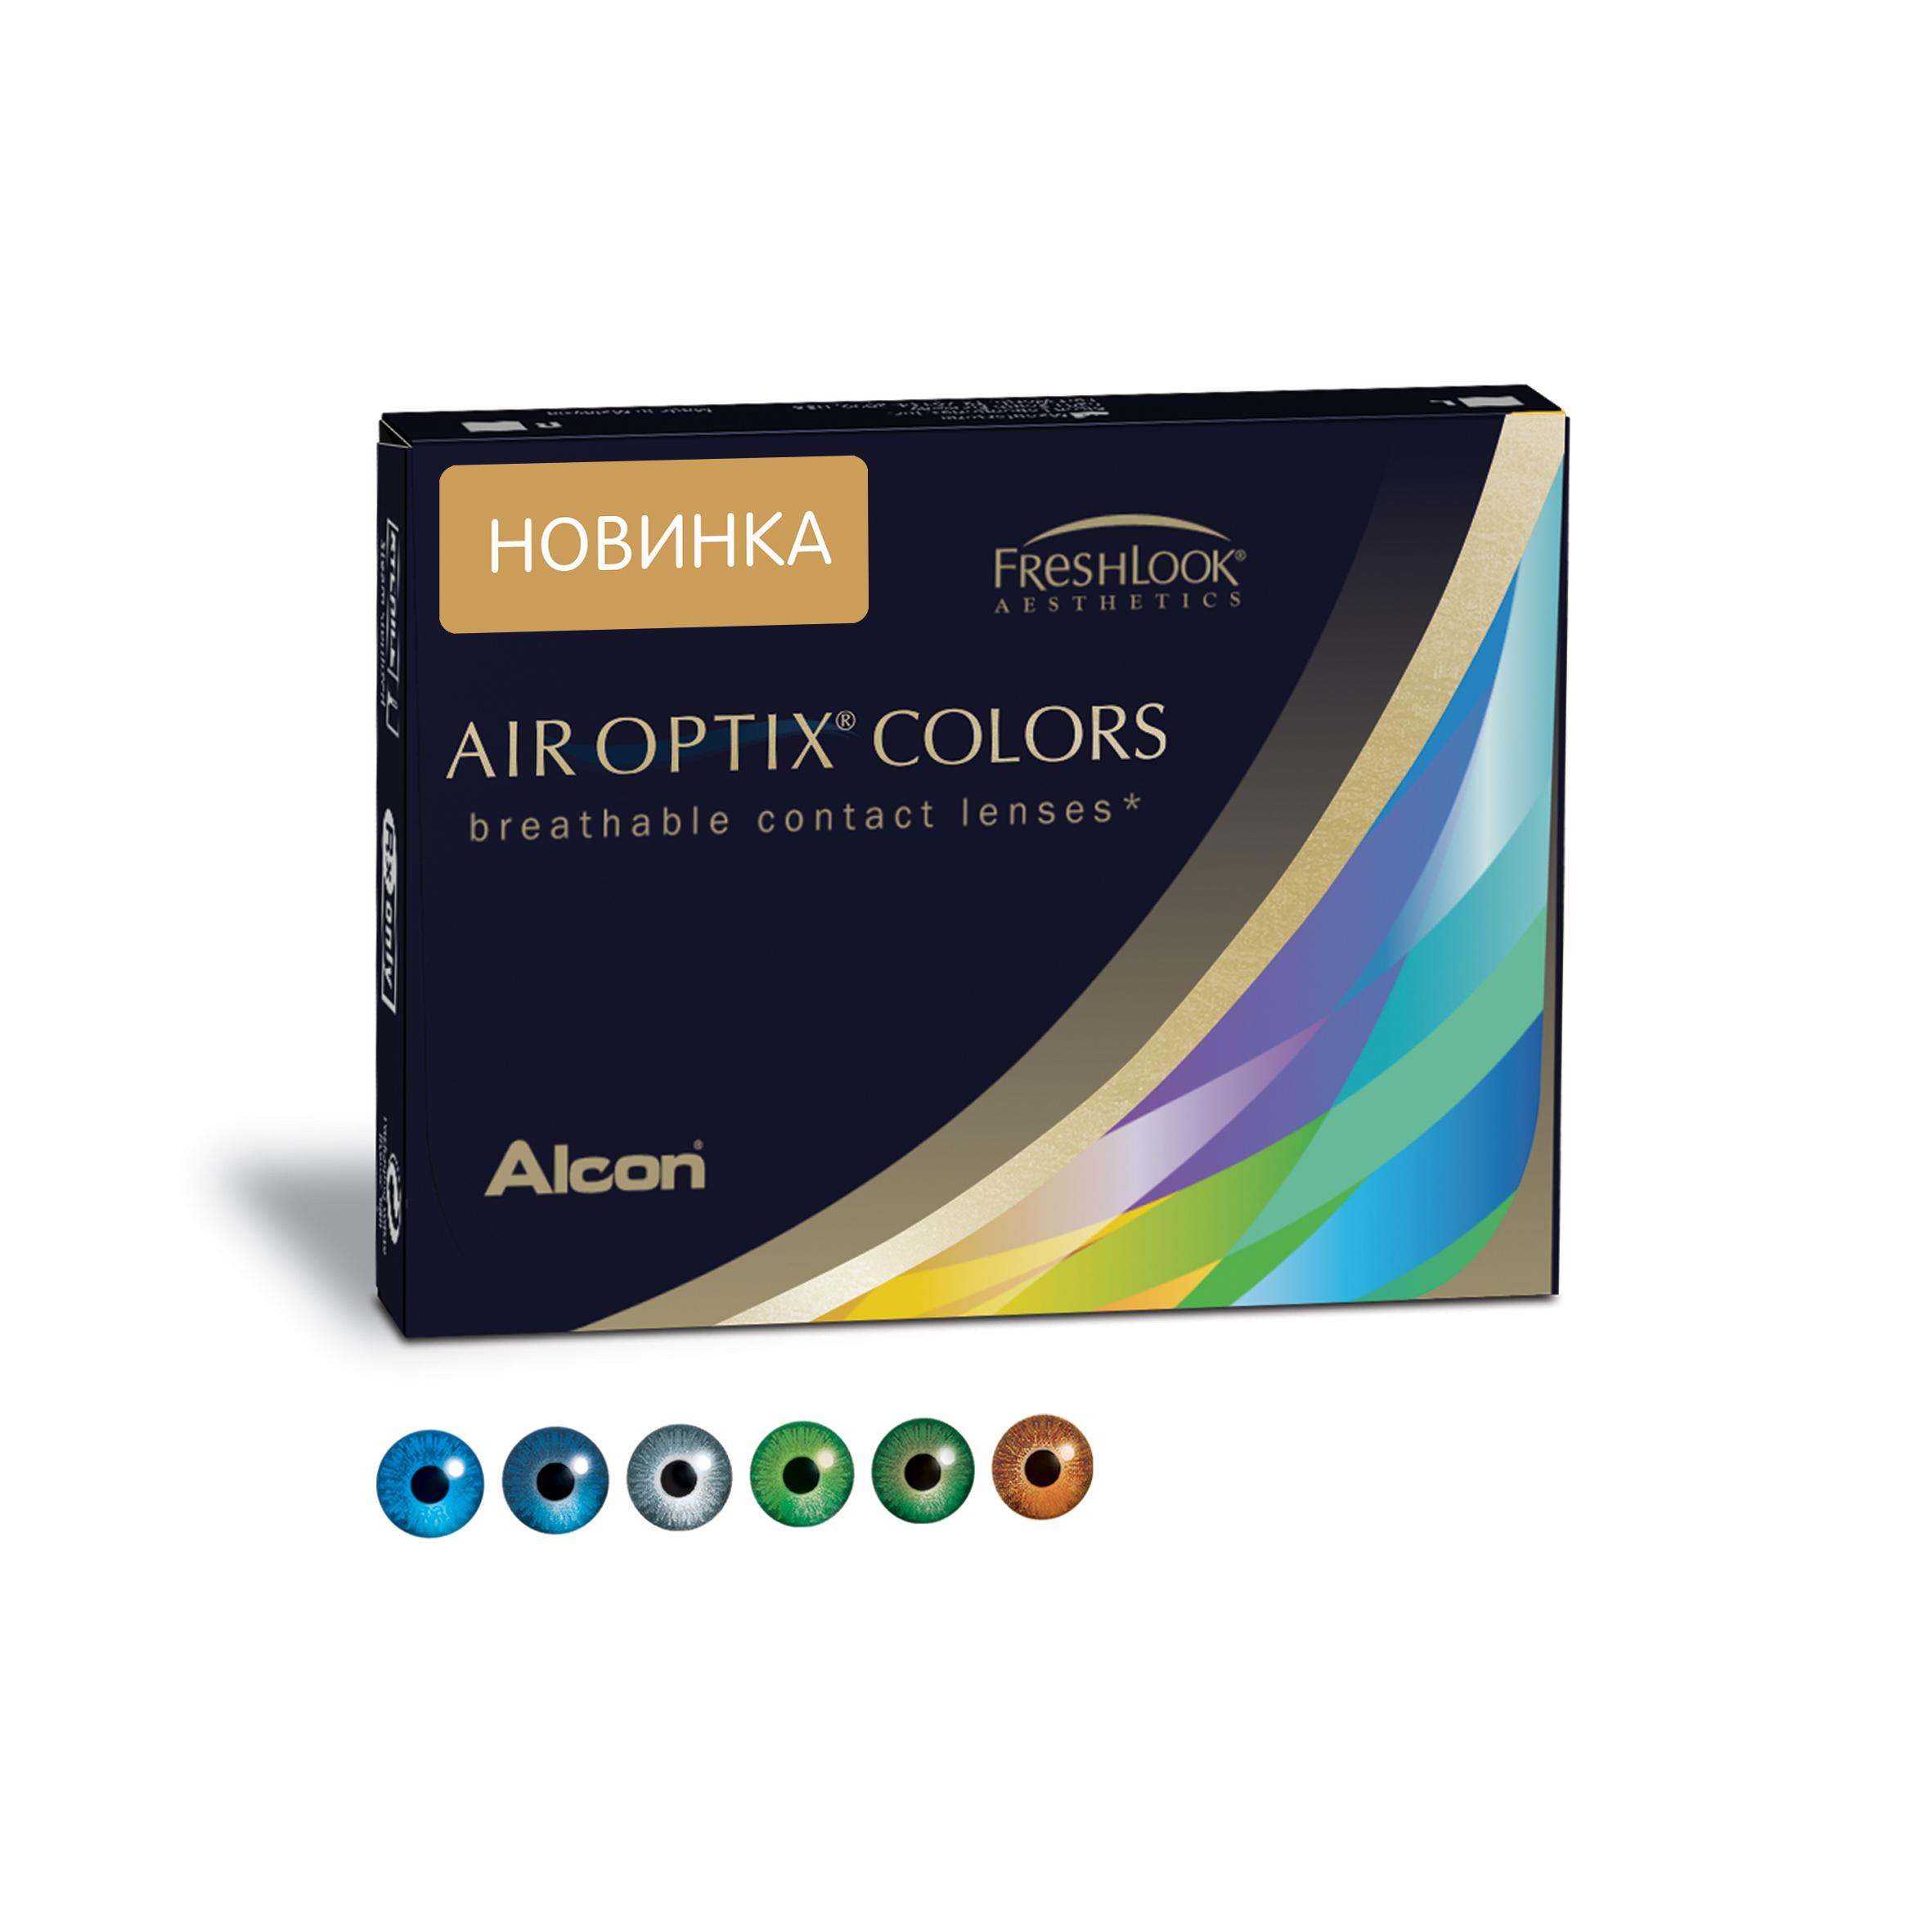 Аlcon контактные линзы Air Optix Colors 2 шт -4.75 Brilliant Blue31746257Мягкие контактные линзы